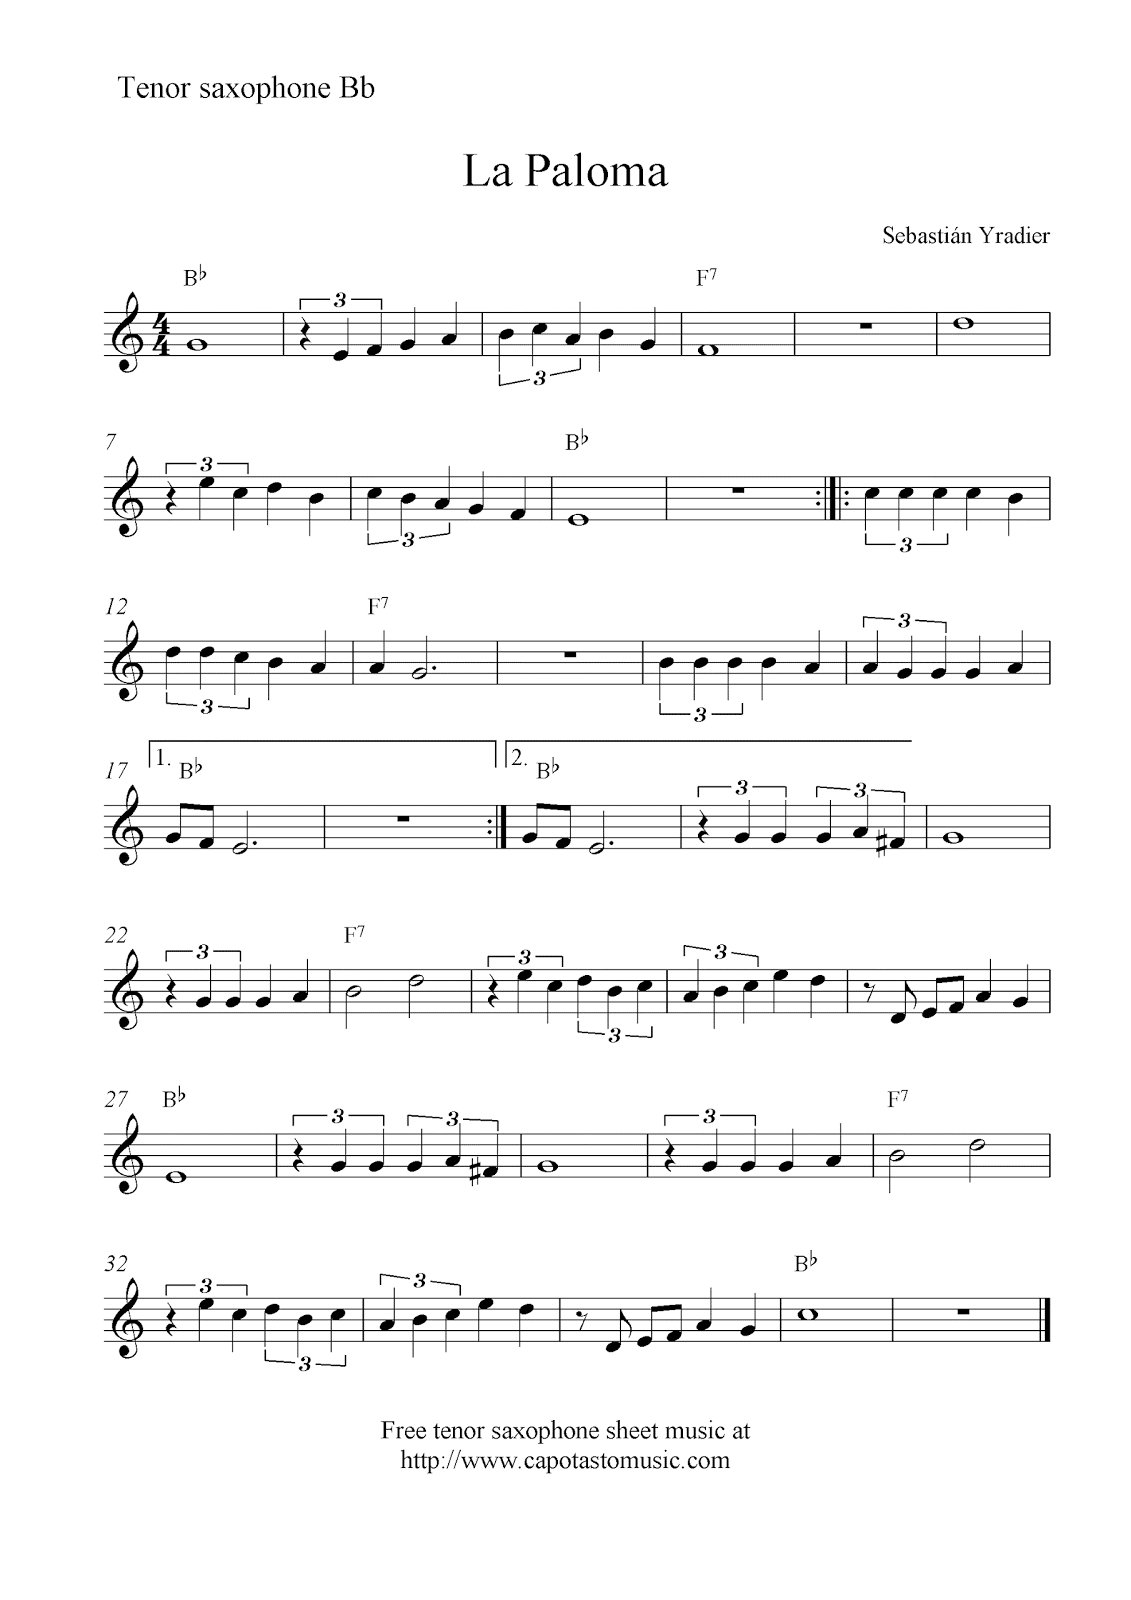 Free tenor saxophone sheet music, La Paloma